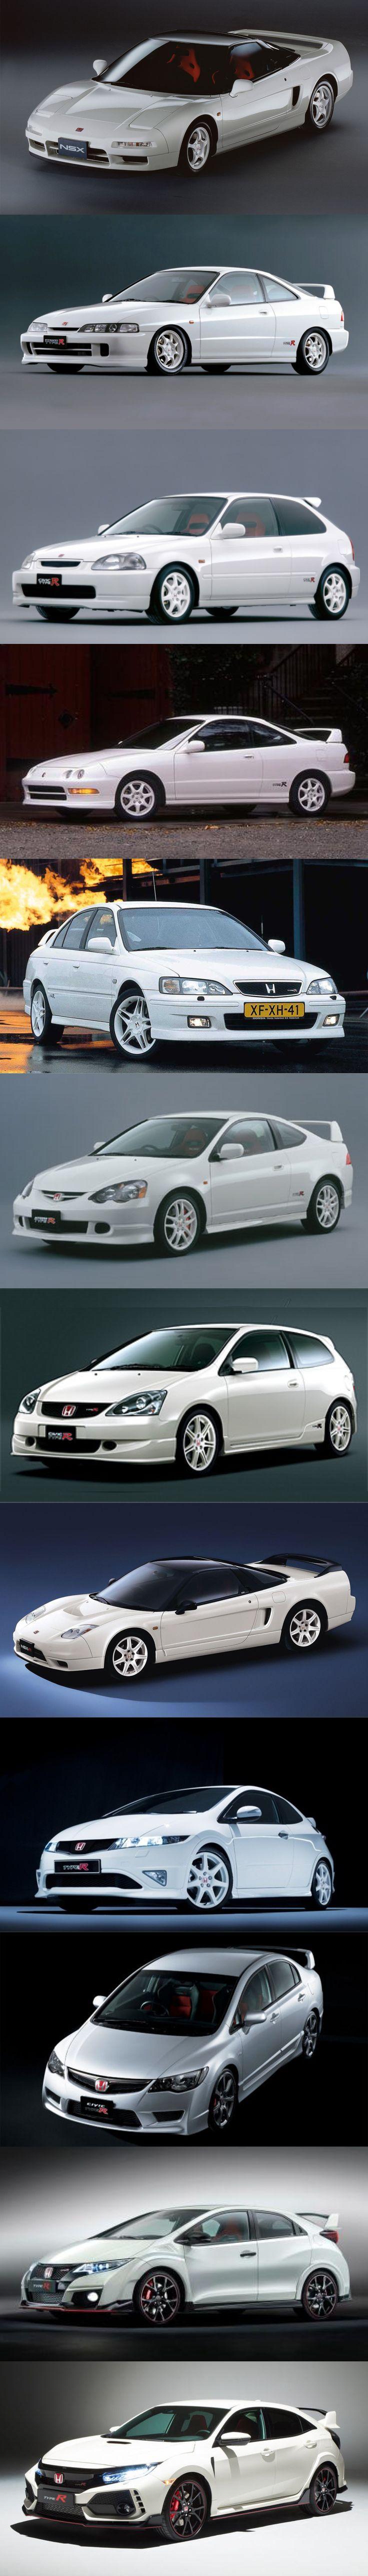 Honda Type R evolution / 1992 NSX / 1995 Integra / 1997 EK9 Civic / 1998 Integra / 1999 Accord / 2001 Integra - RSX / 2001 EP3 Civic / 2002 NSX facelift / 2007 FN2 - FD2 Civic / 2015 FK2 Civic / 2017 FK8 Civic / Japan / white